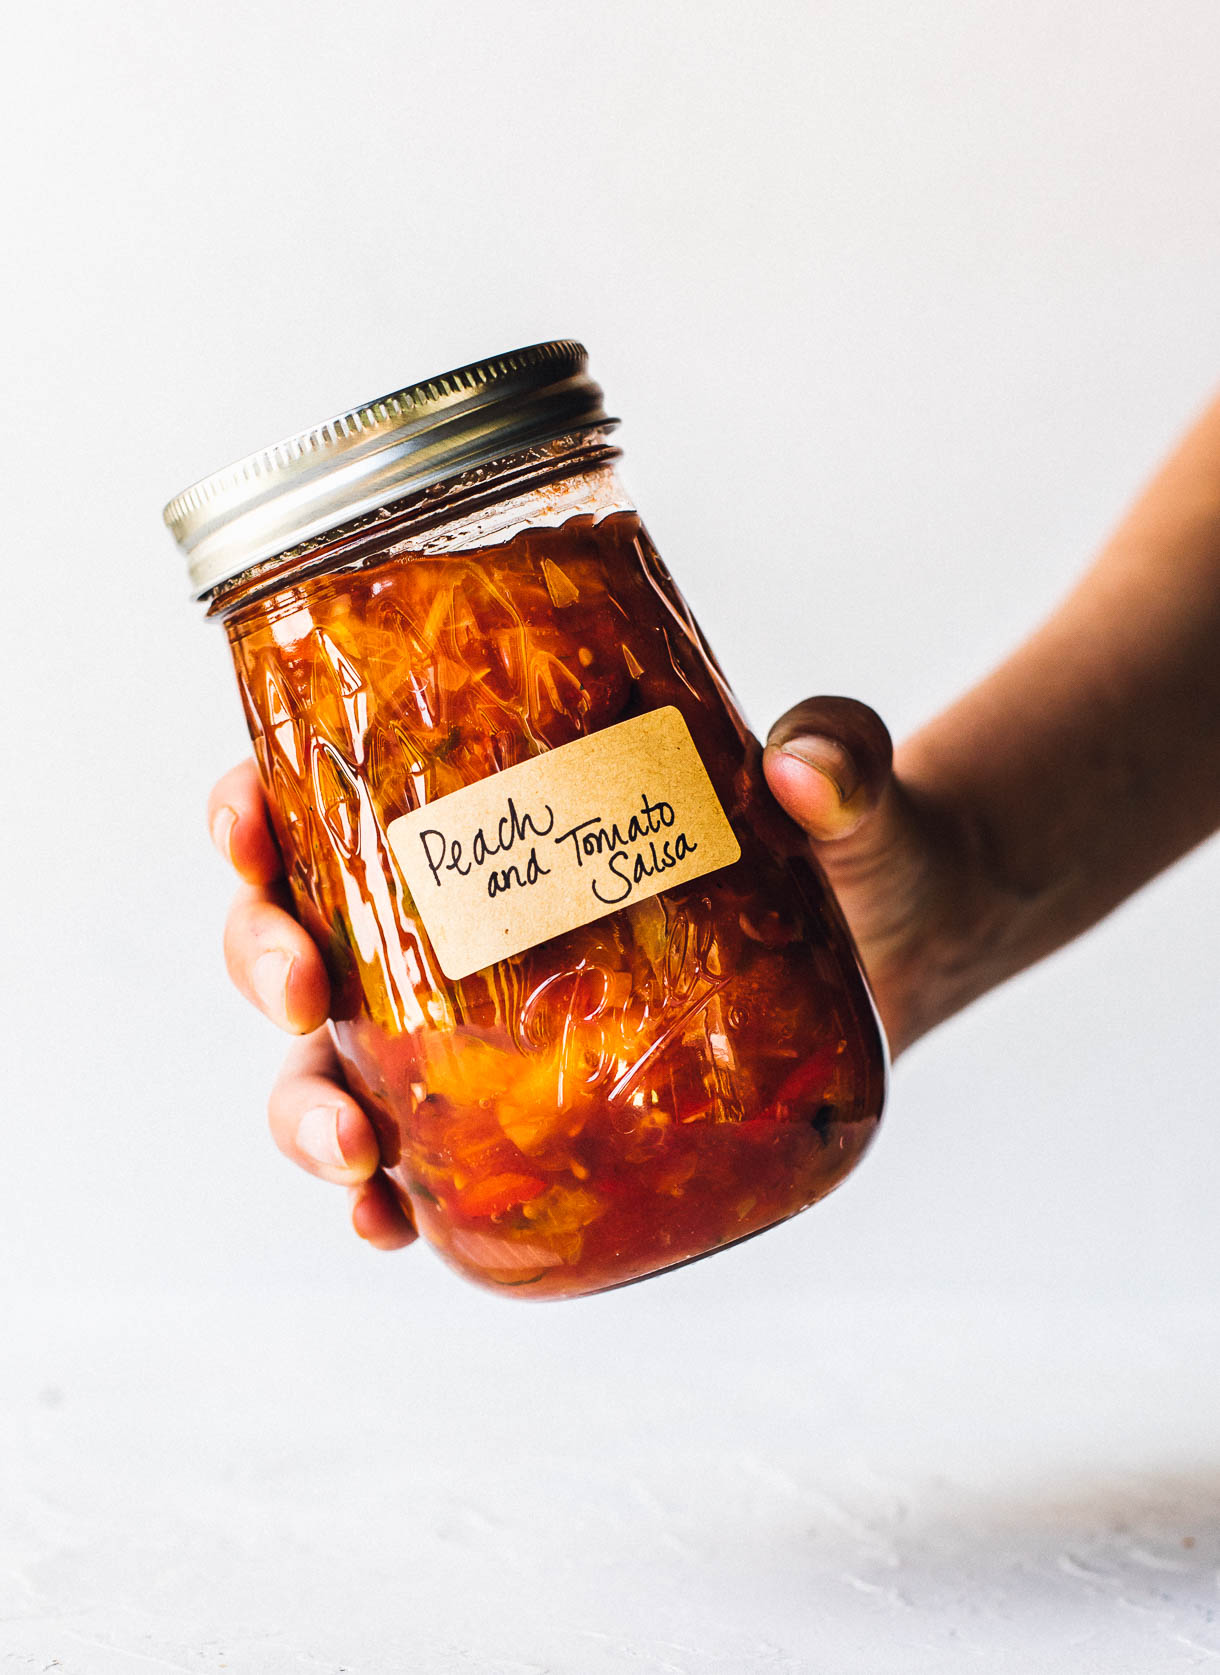 holding a jar of tomato peach salsa